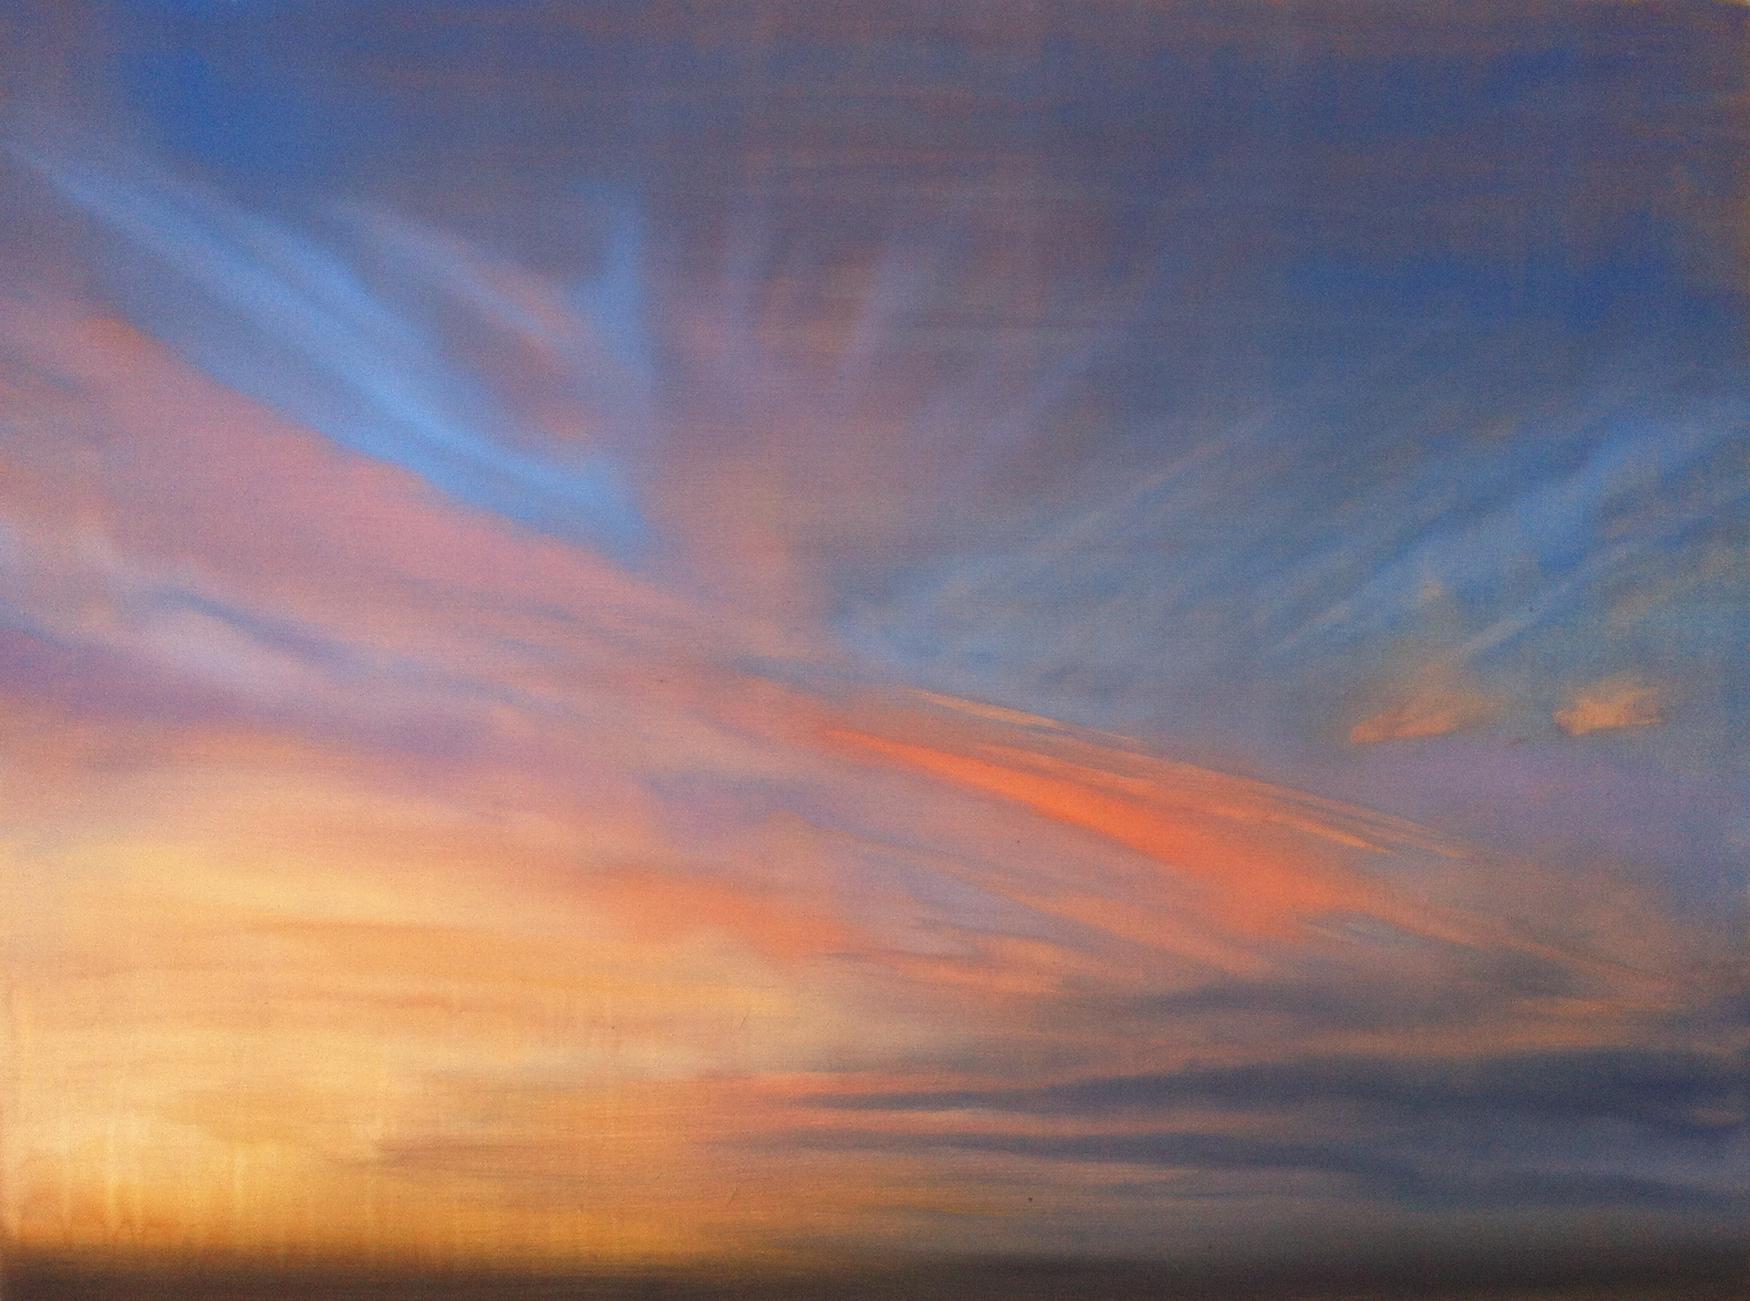 "Wide Awake,  o il on canvas, 36 x 48"""